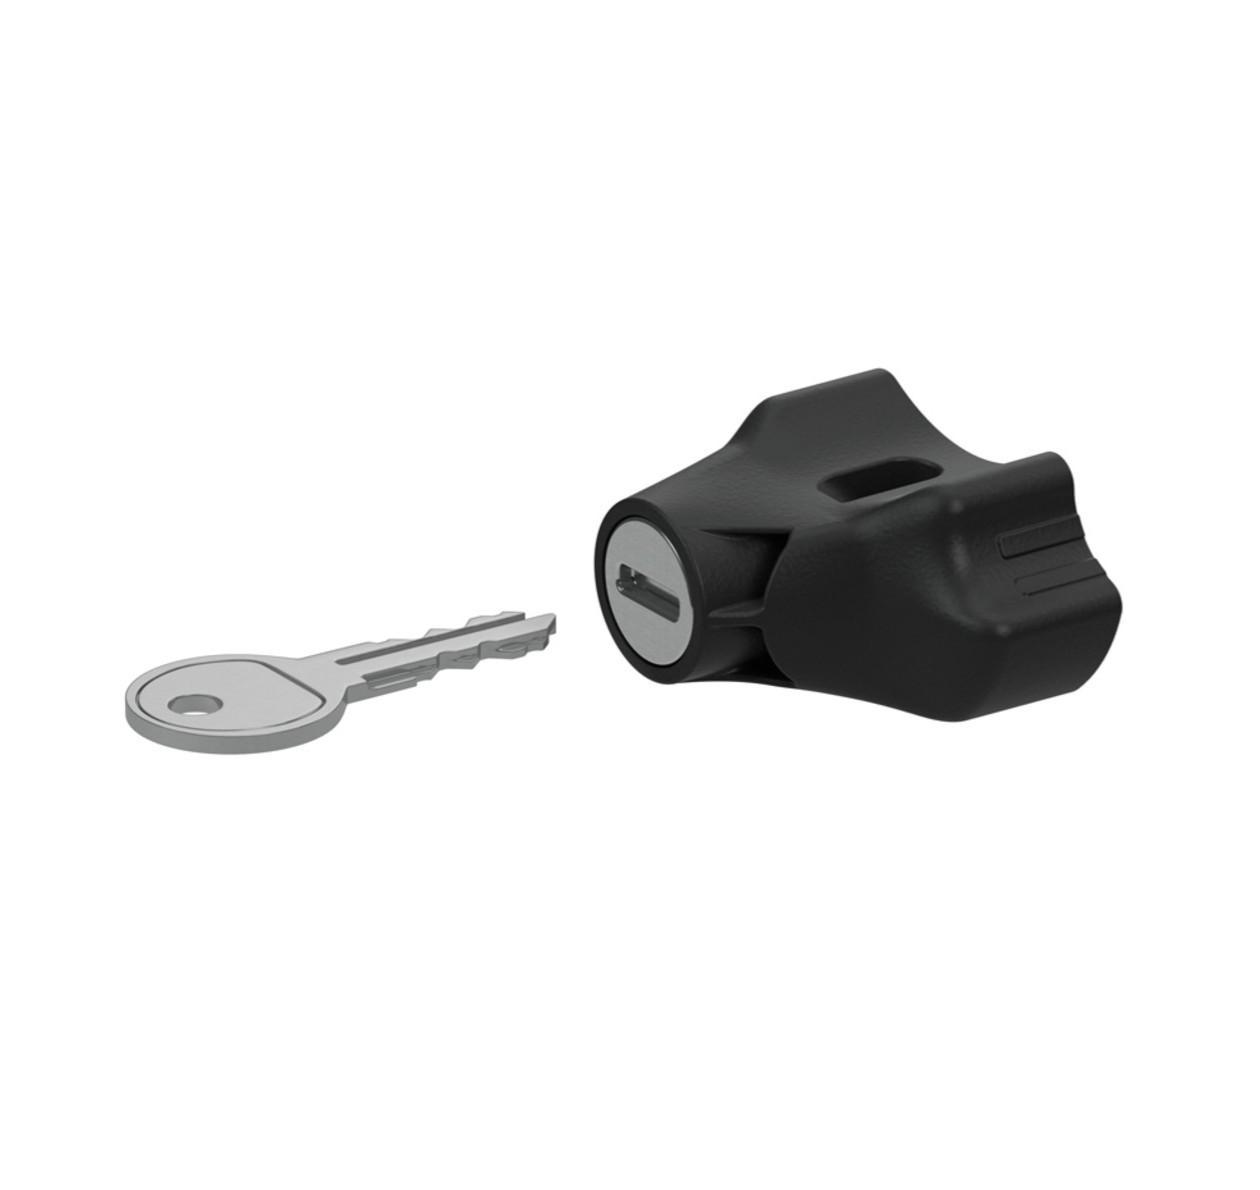 Thule - Lock Kit (2x locks)